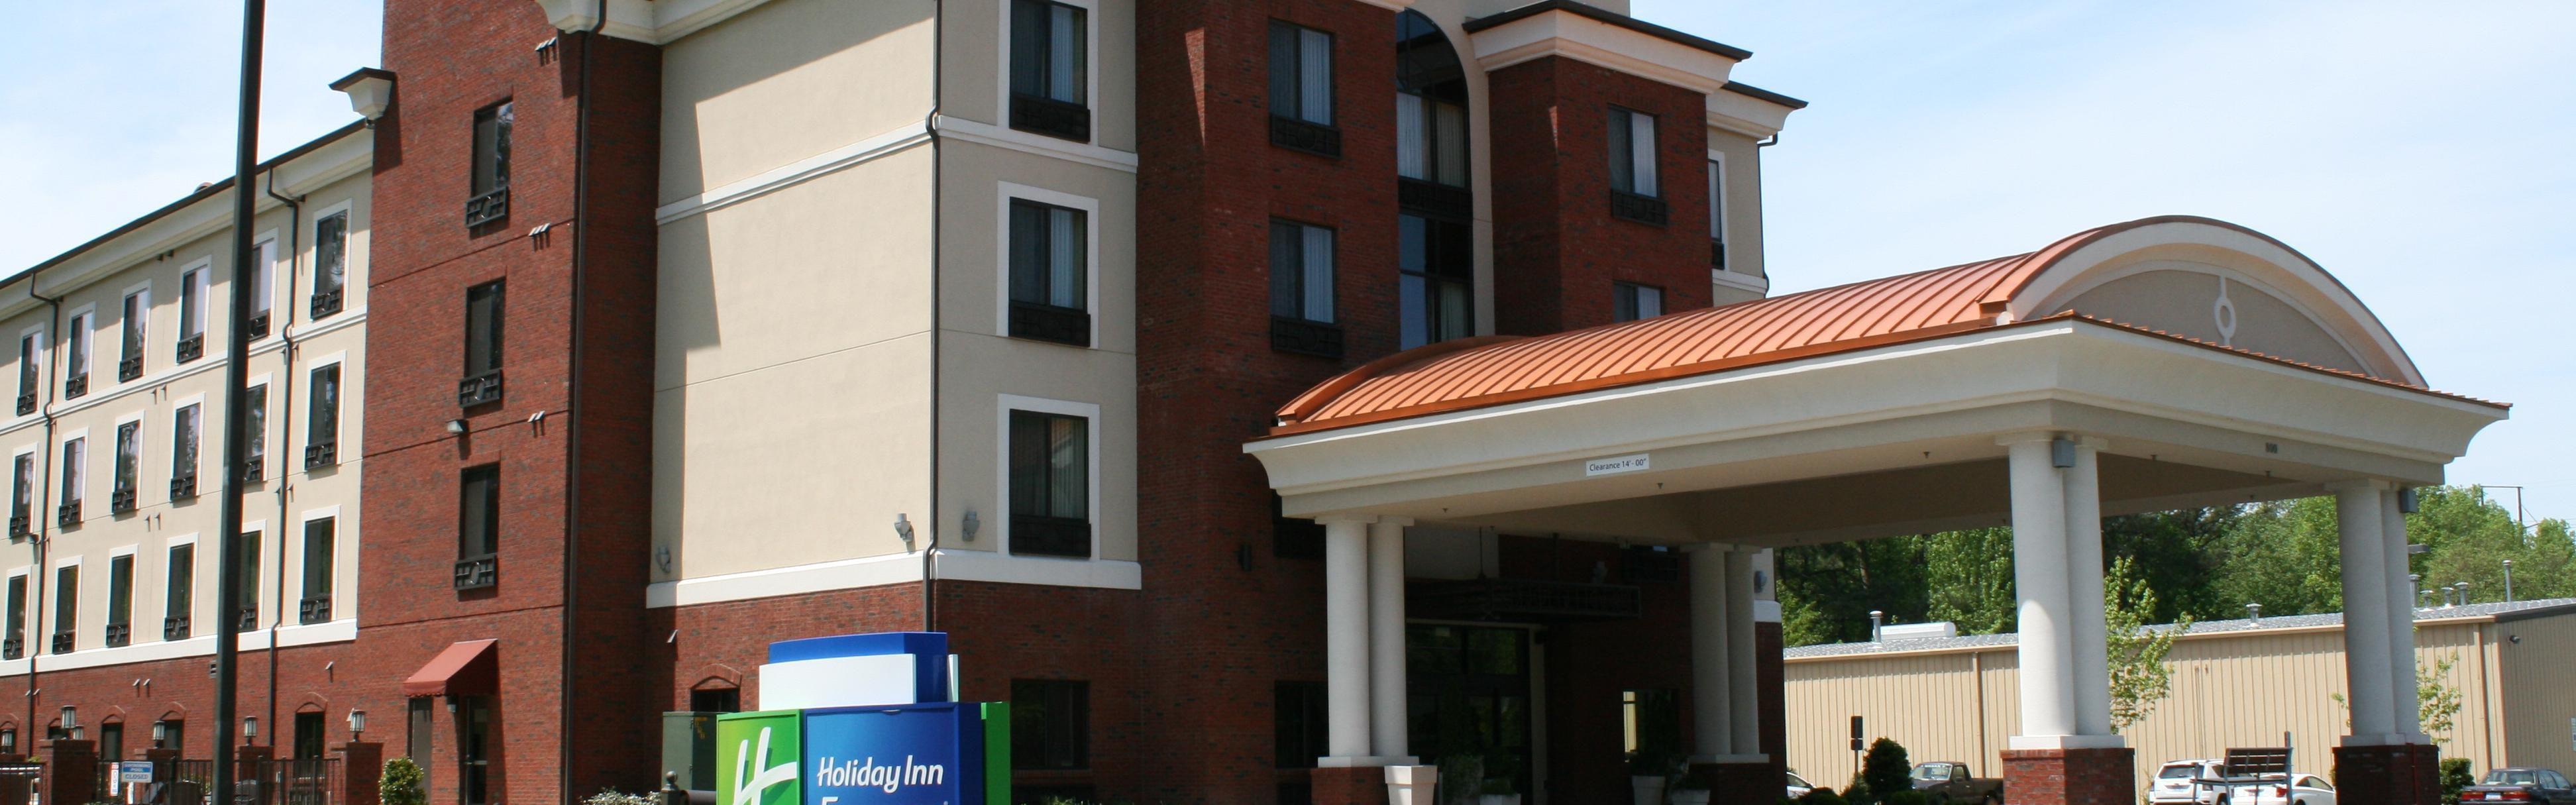 Holiday Inn Express Rockingham image 0